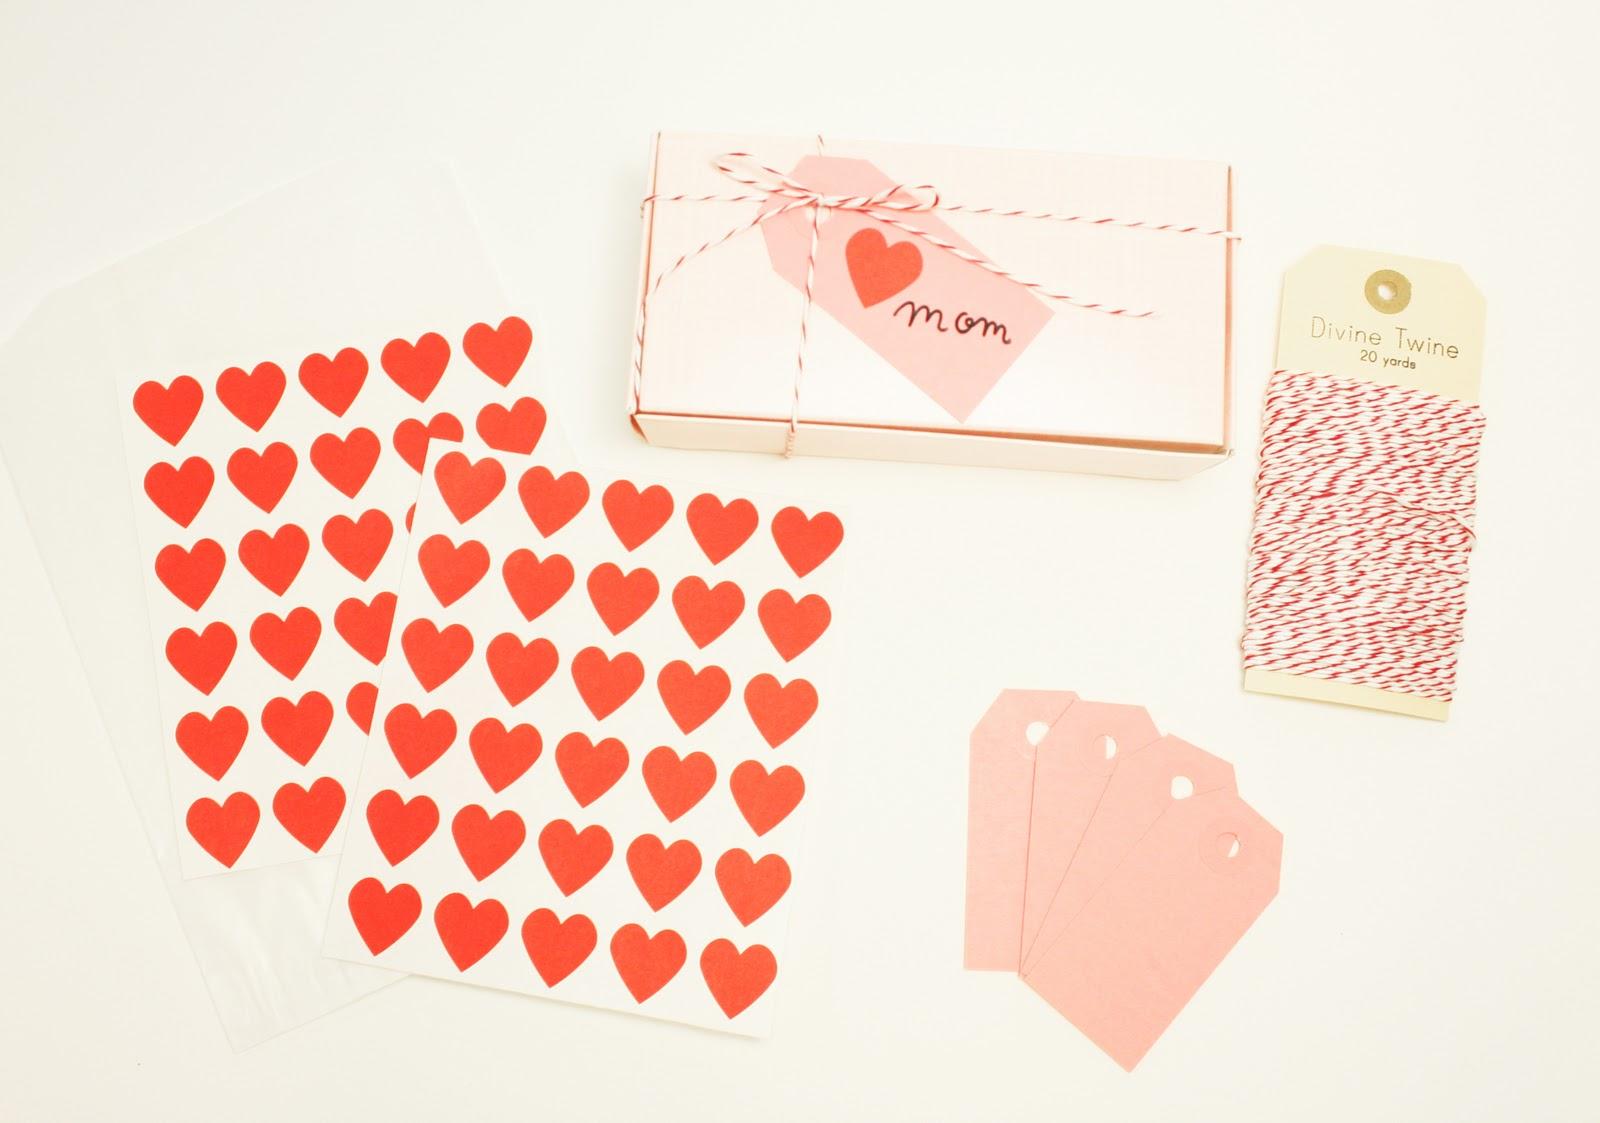 http://2.bp.blogspot.com/_zJ6zdRxnutQ/TVK-MMtNnjI/AAAAAAAAGbU/OAj9YufEf5g/s1600/pink+gift+wrap+kit.jpg